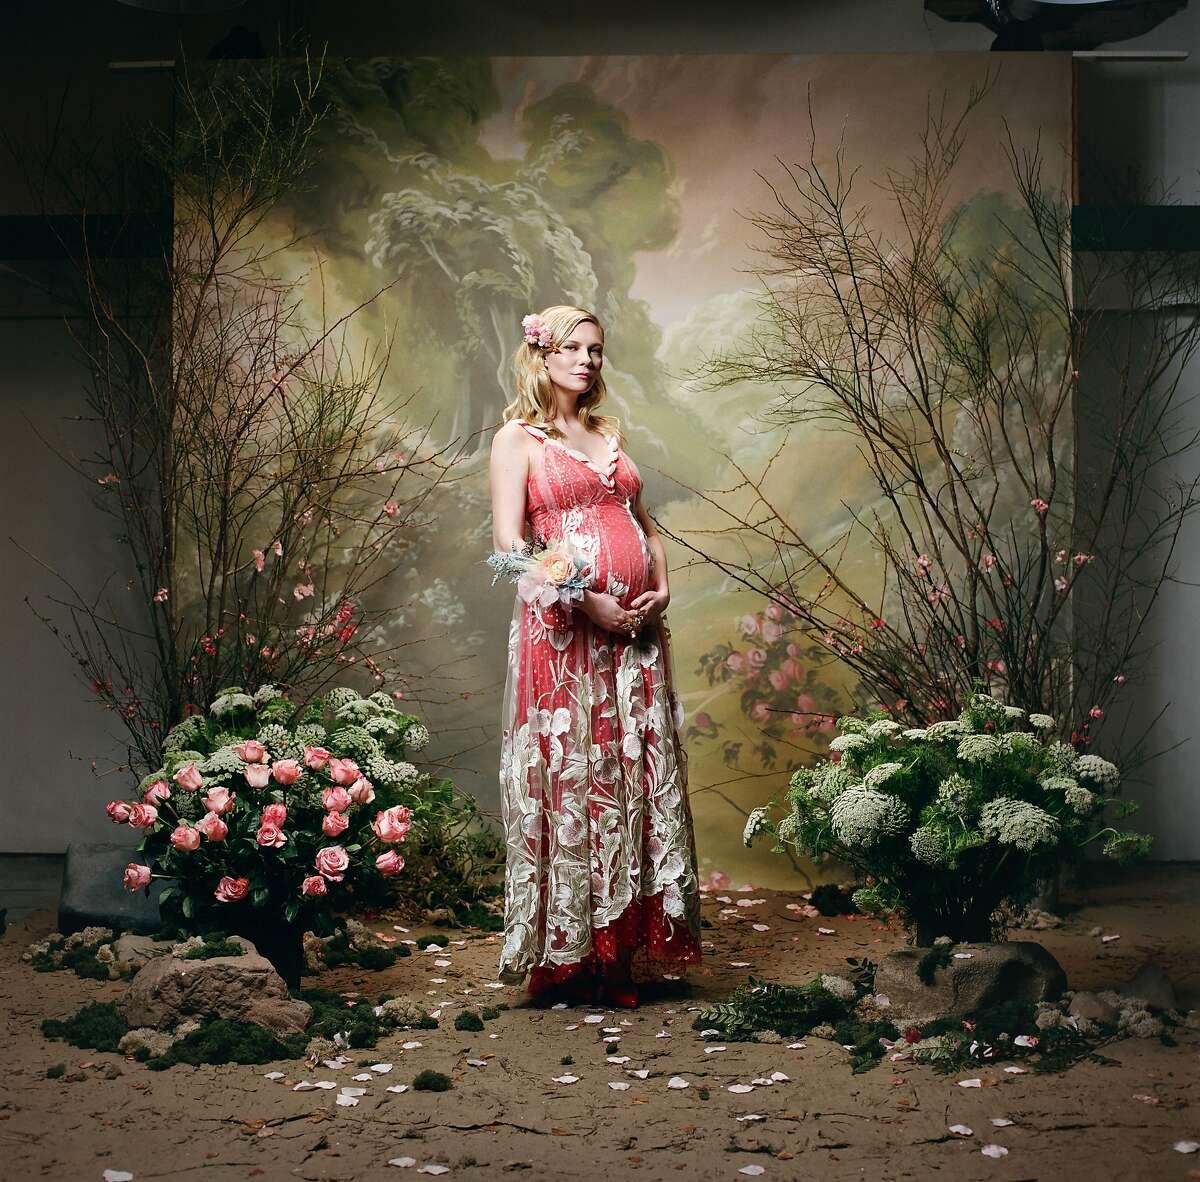 Kirsten Dunst�photographed by Autumn de Wilde as part of Rodarte's Spring 2018 portrait series.